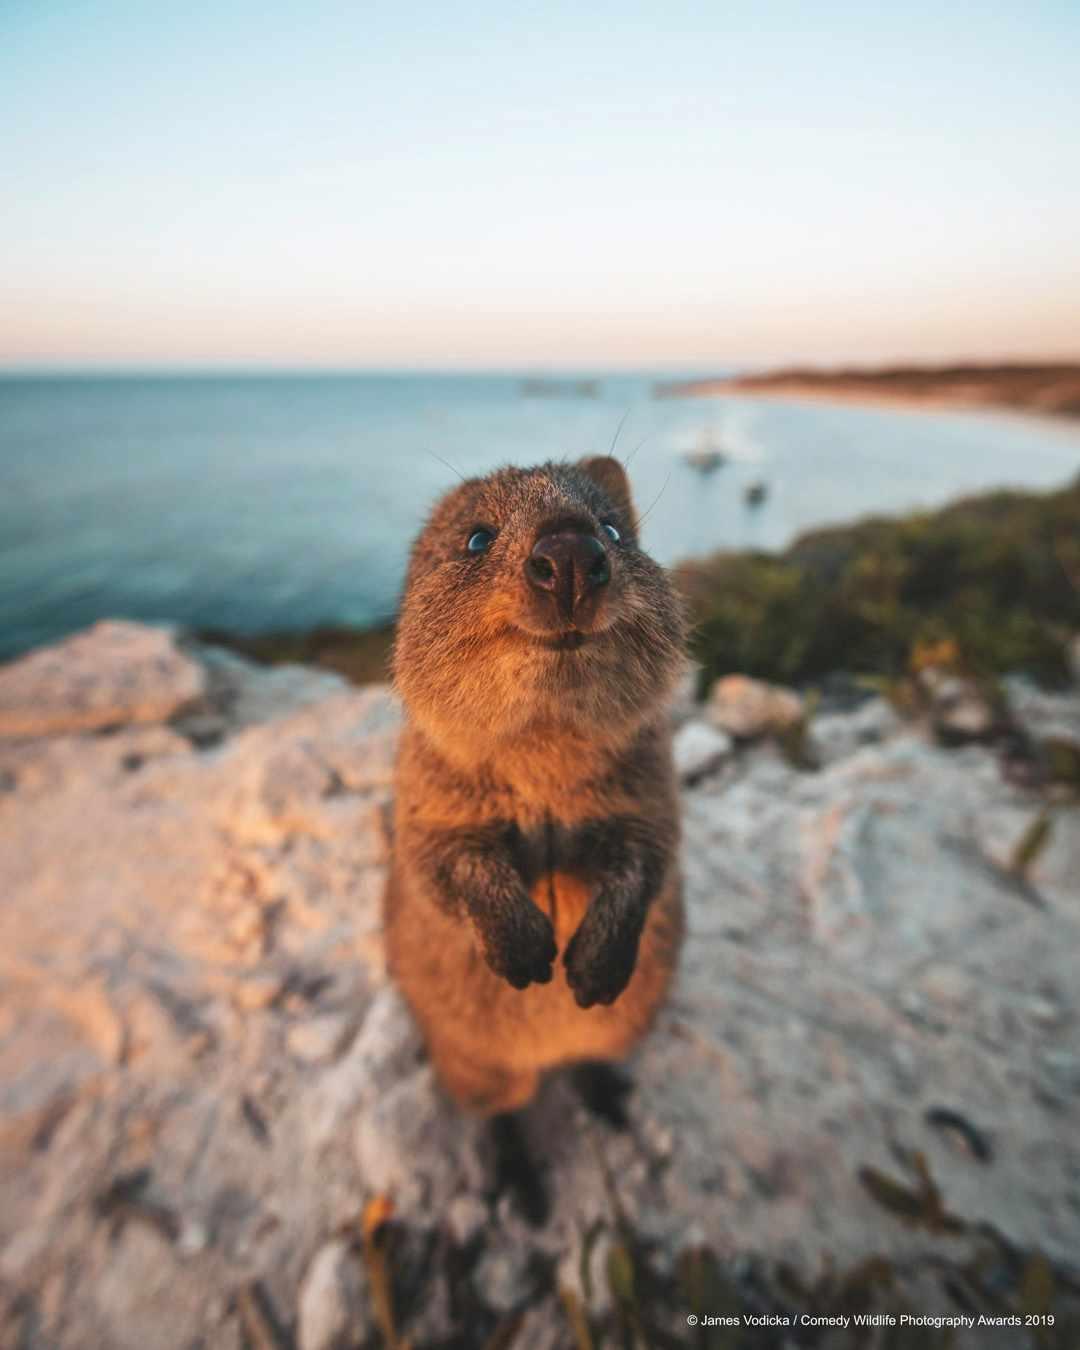 Excuse me © James Vodicka / Comedy Wildlife Photo Awards 2019